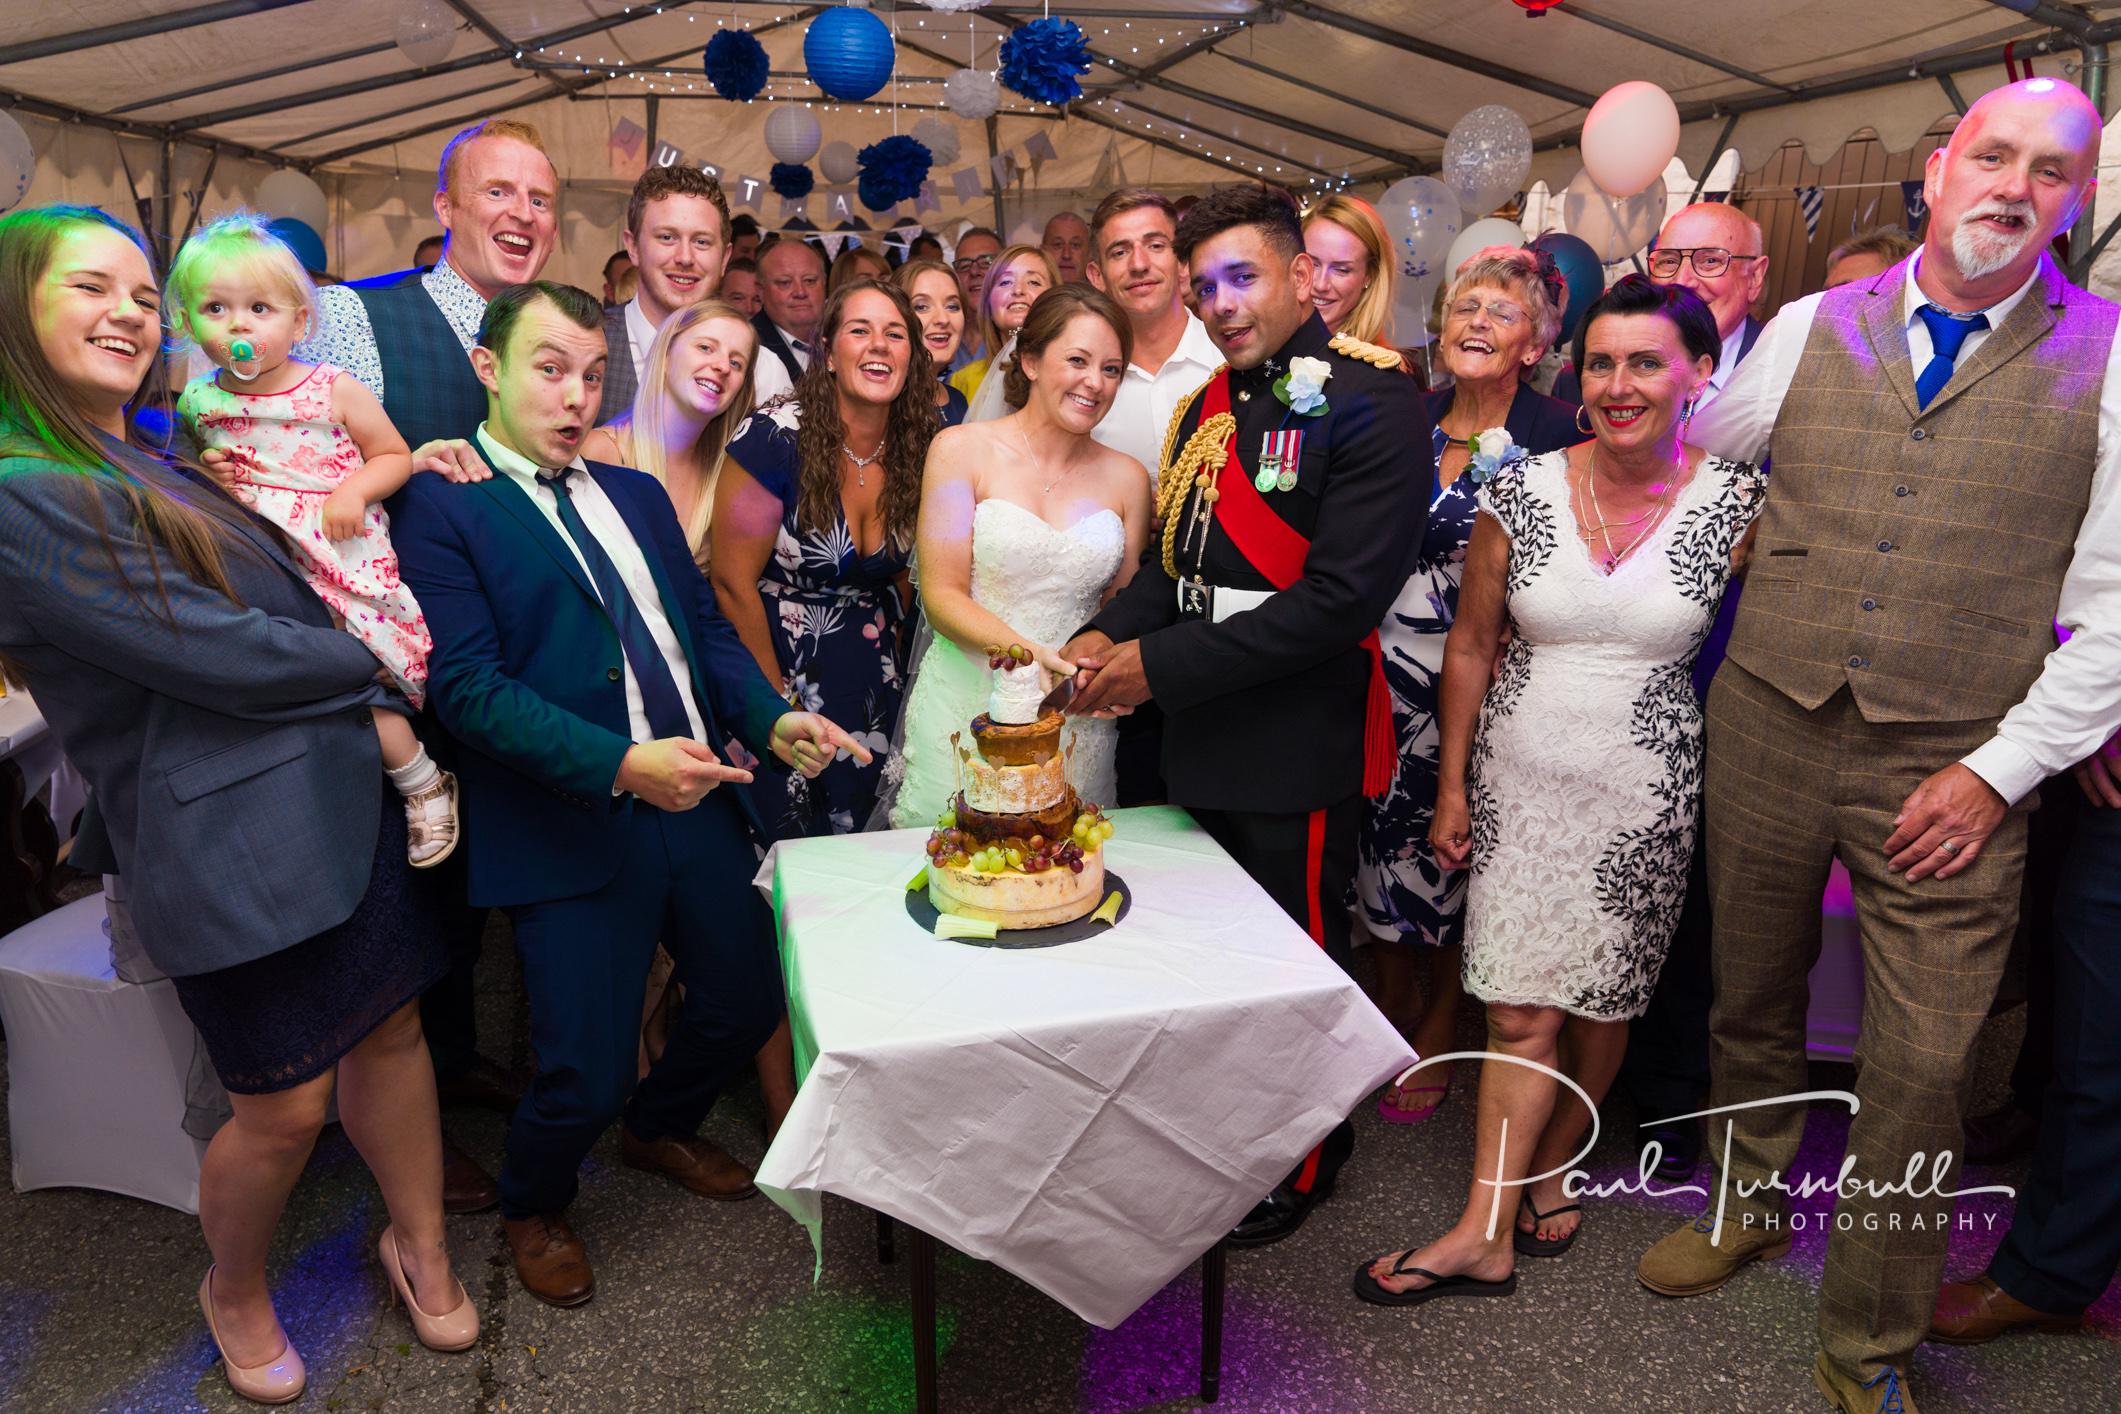 wedding-photographer-south-dalton-walkington-yorkshire-emma-james-079.jpg